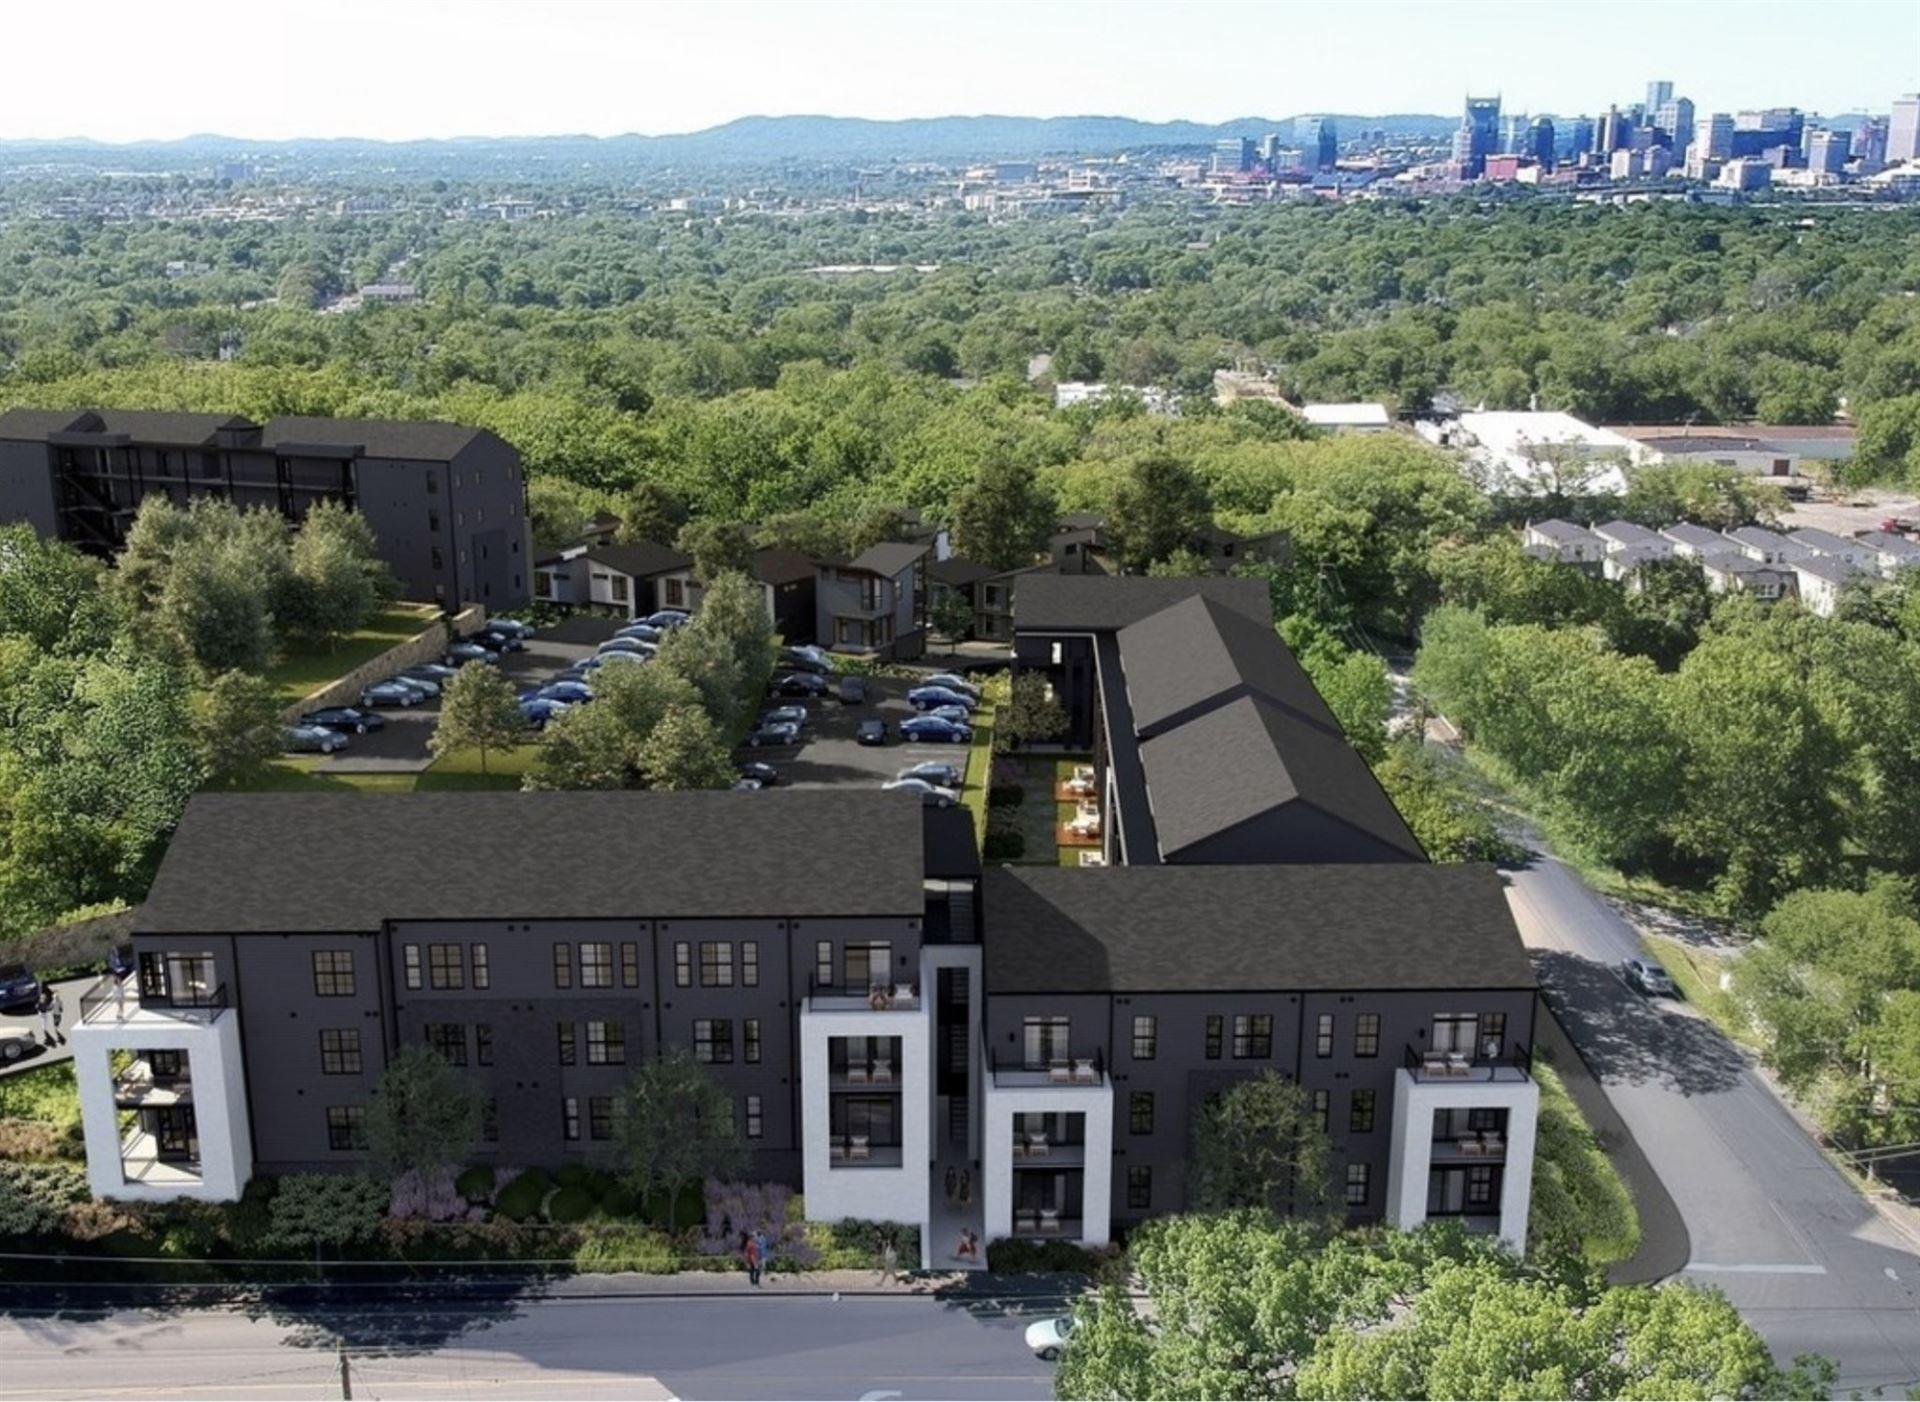 600 E. Trinity Ln #108, Nashville, TN 37207 - MLS#: 2295066